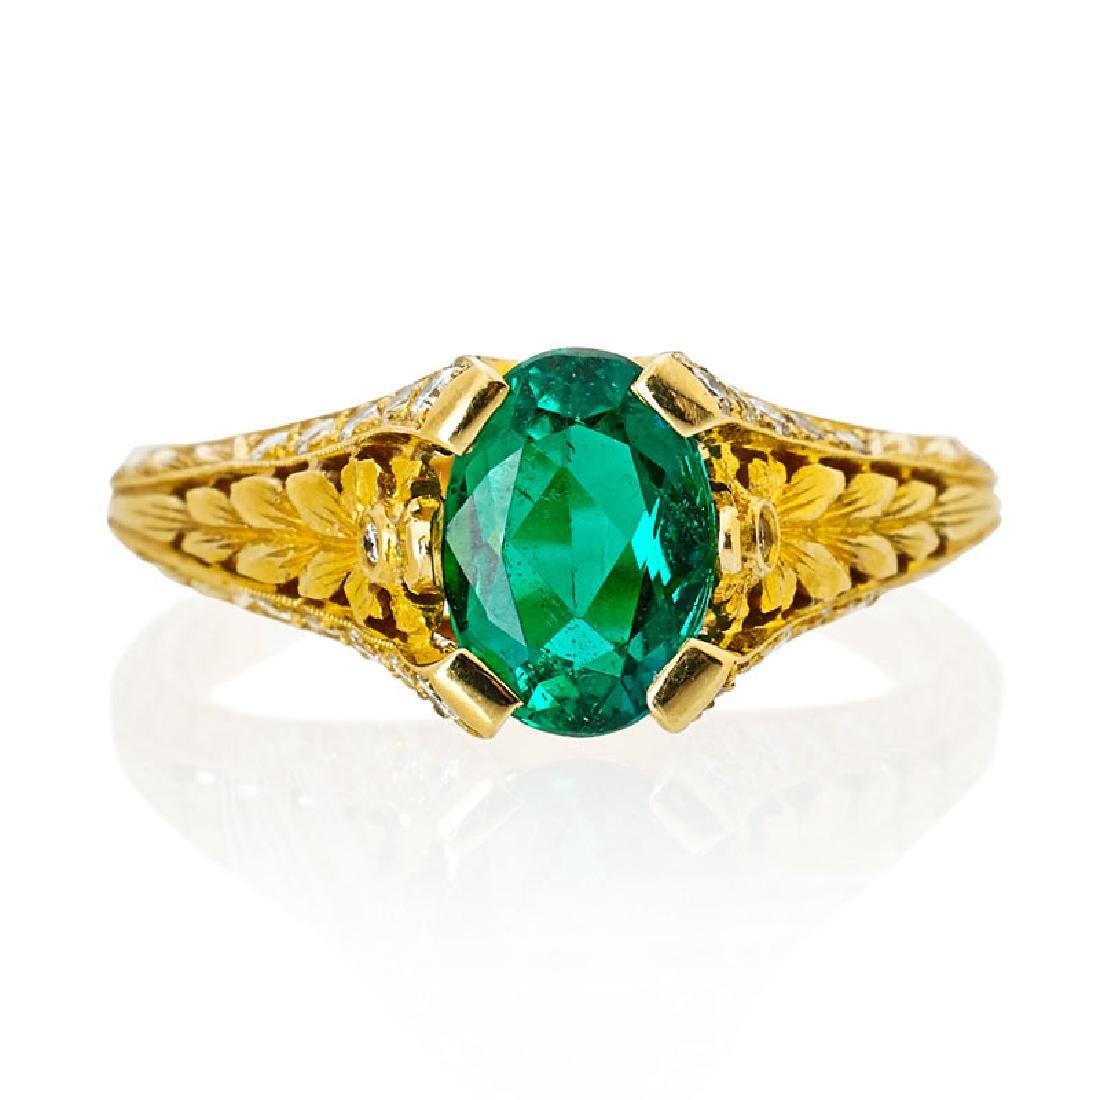 EMERALD & DIAMOND CHASED 18K GOLD RING